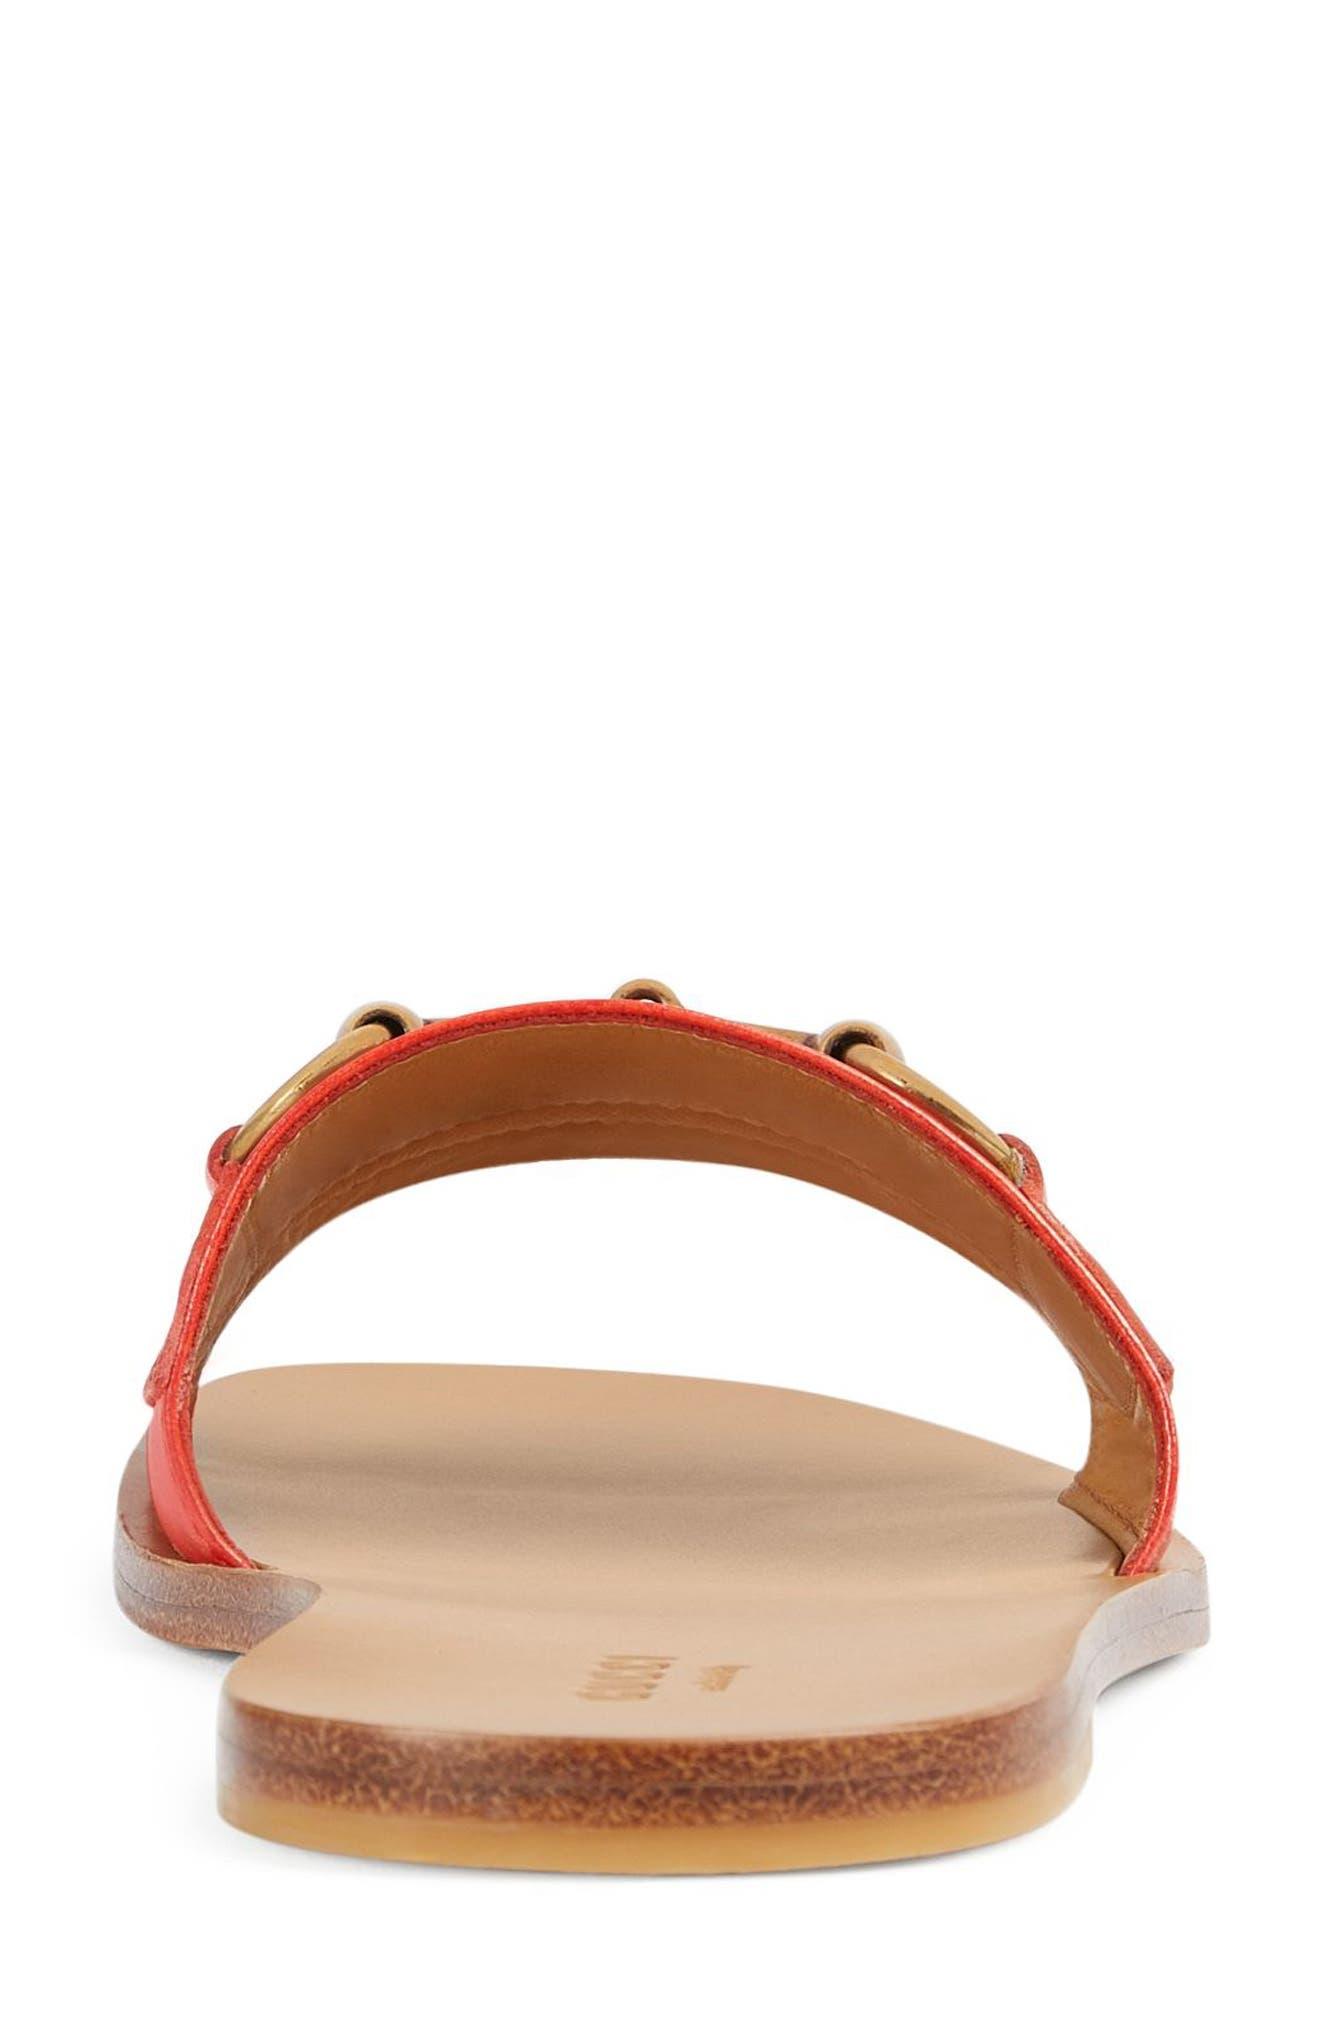 Varadero Slide Sandal,                             Alternate thumbnail 5, color,                             Orange